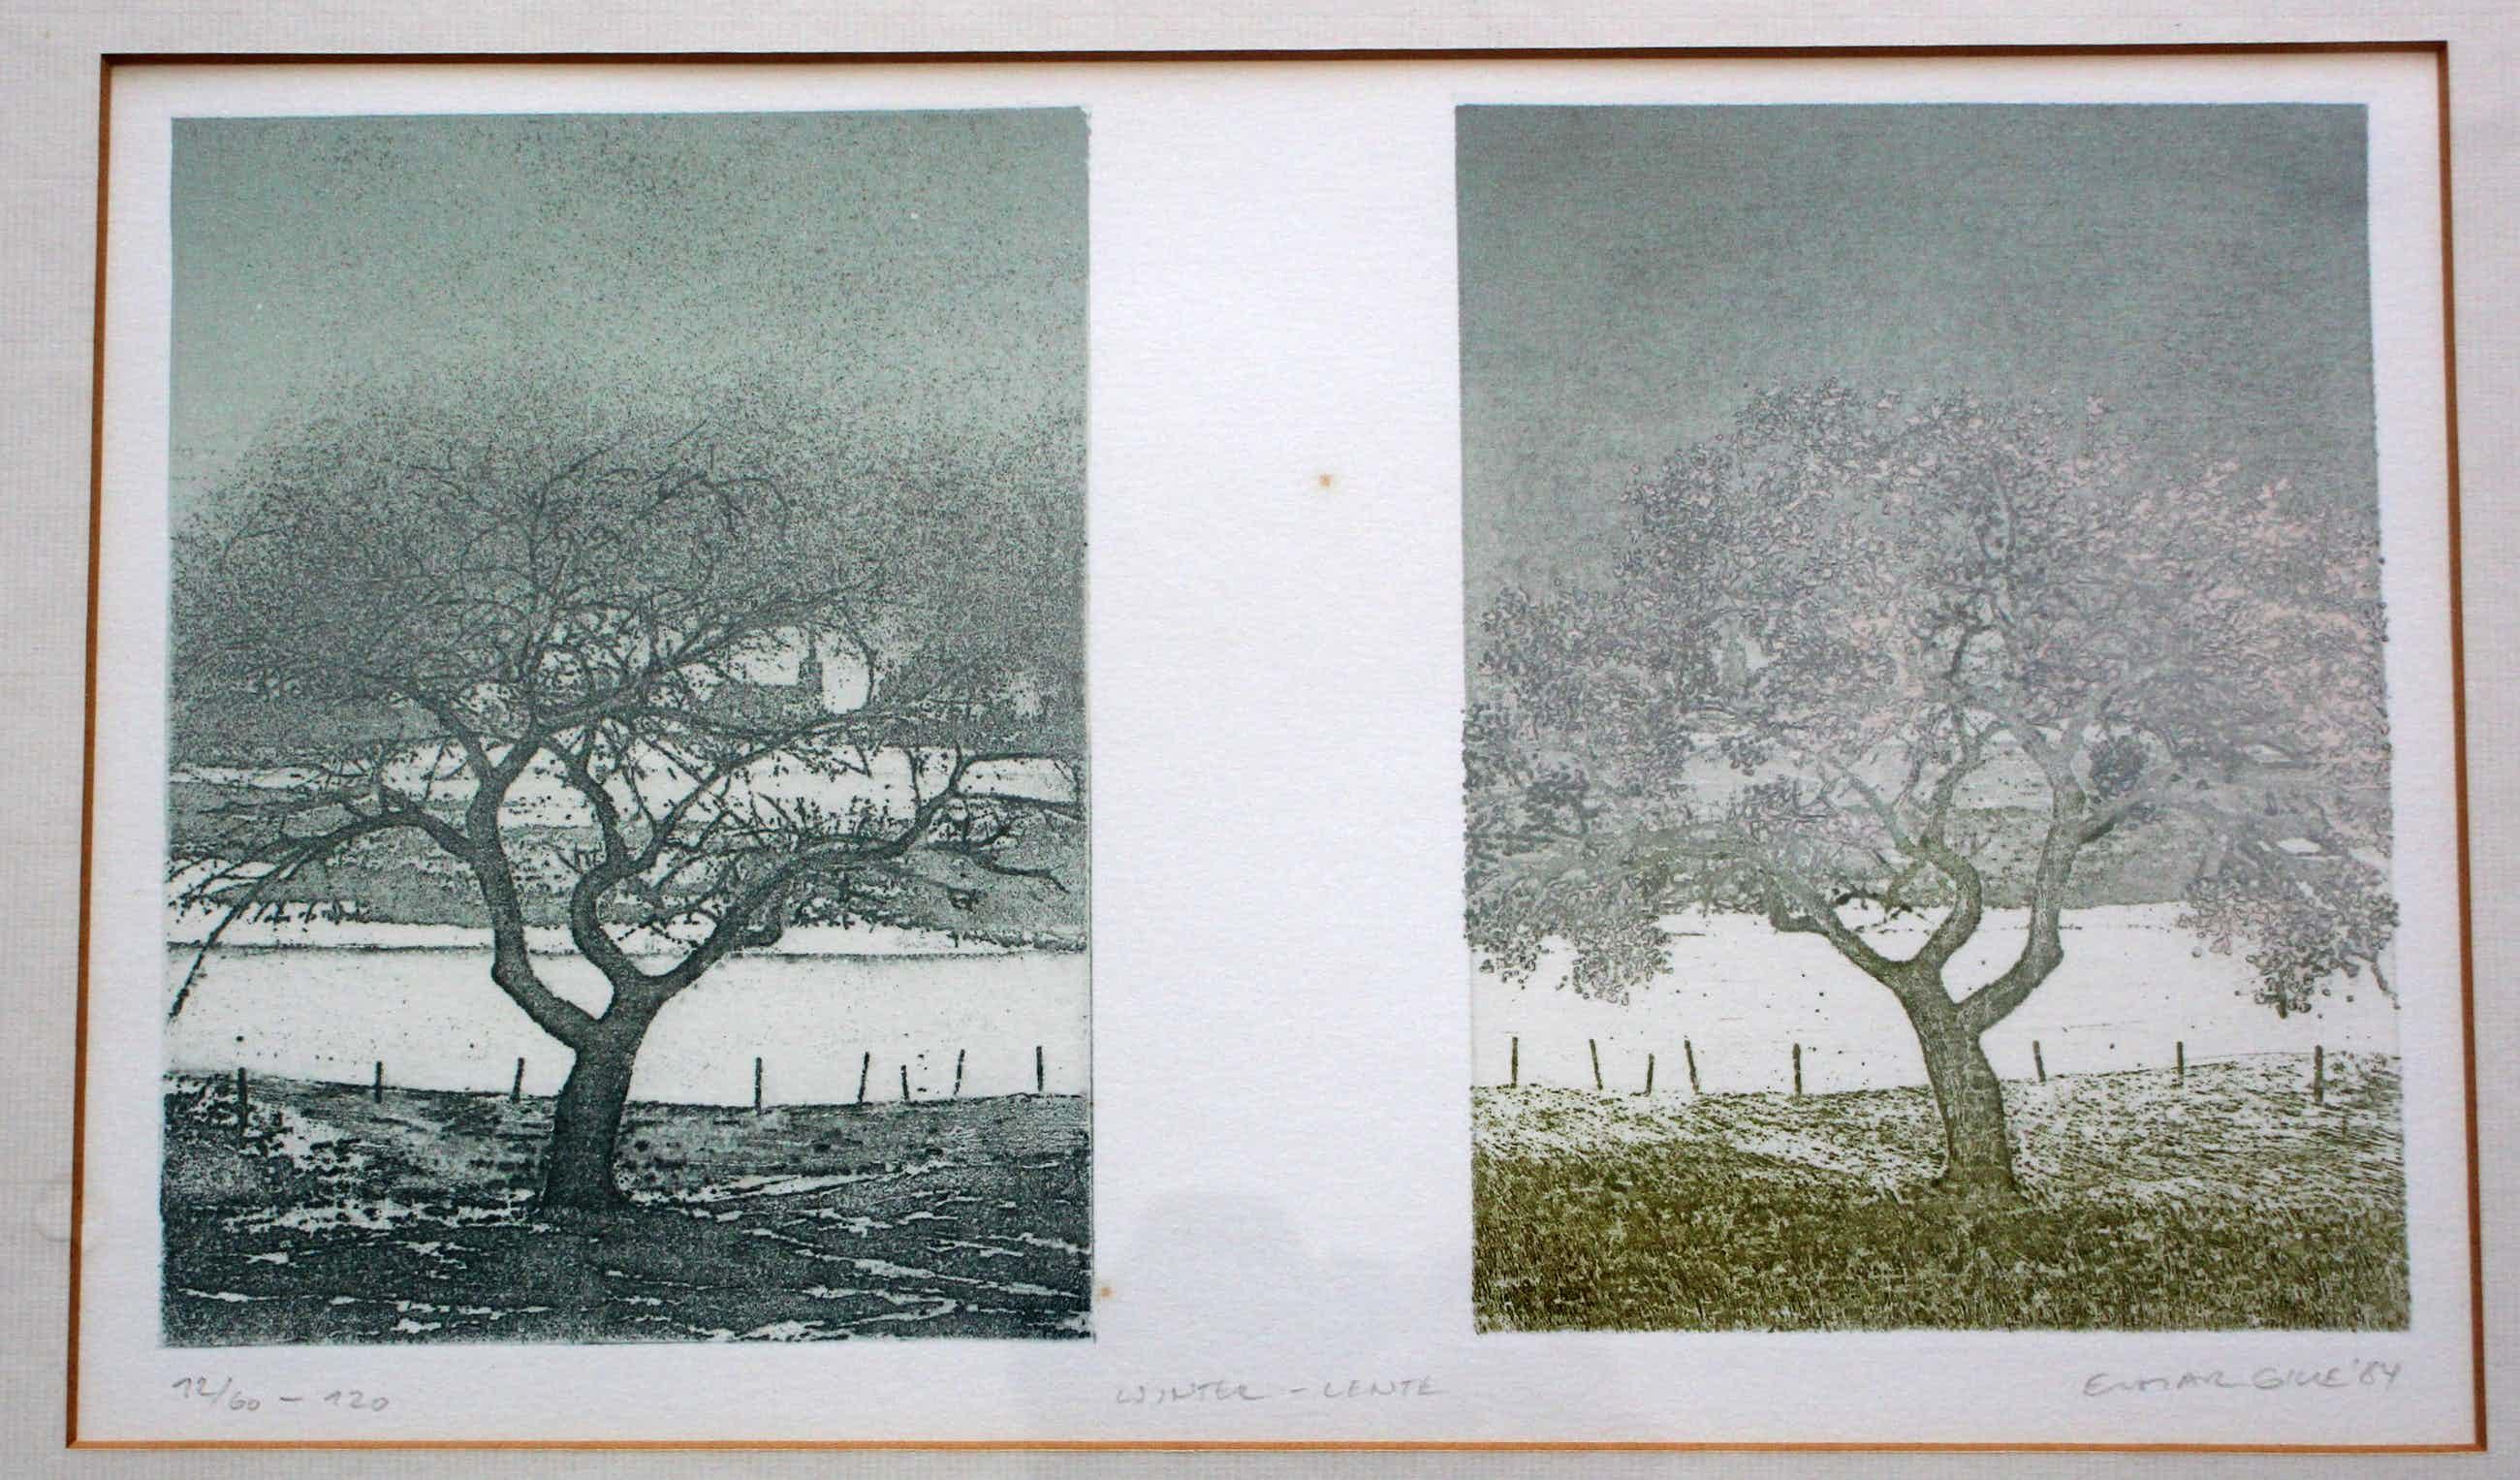 Elmar Gille - Litho: winter/lente - 1984 kopen? Bied vanaf 85!